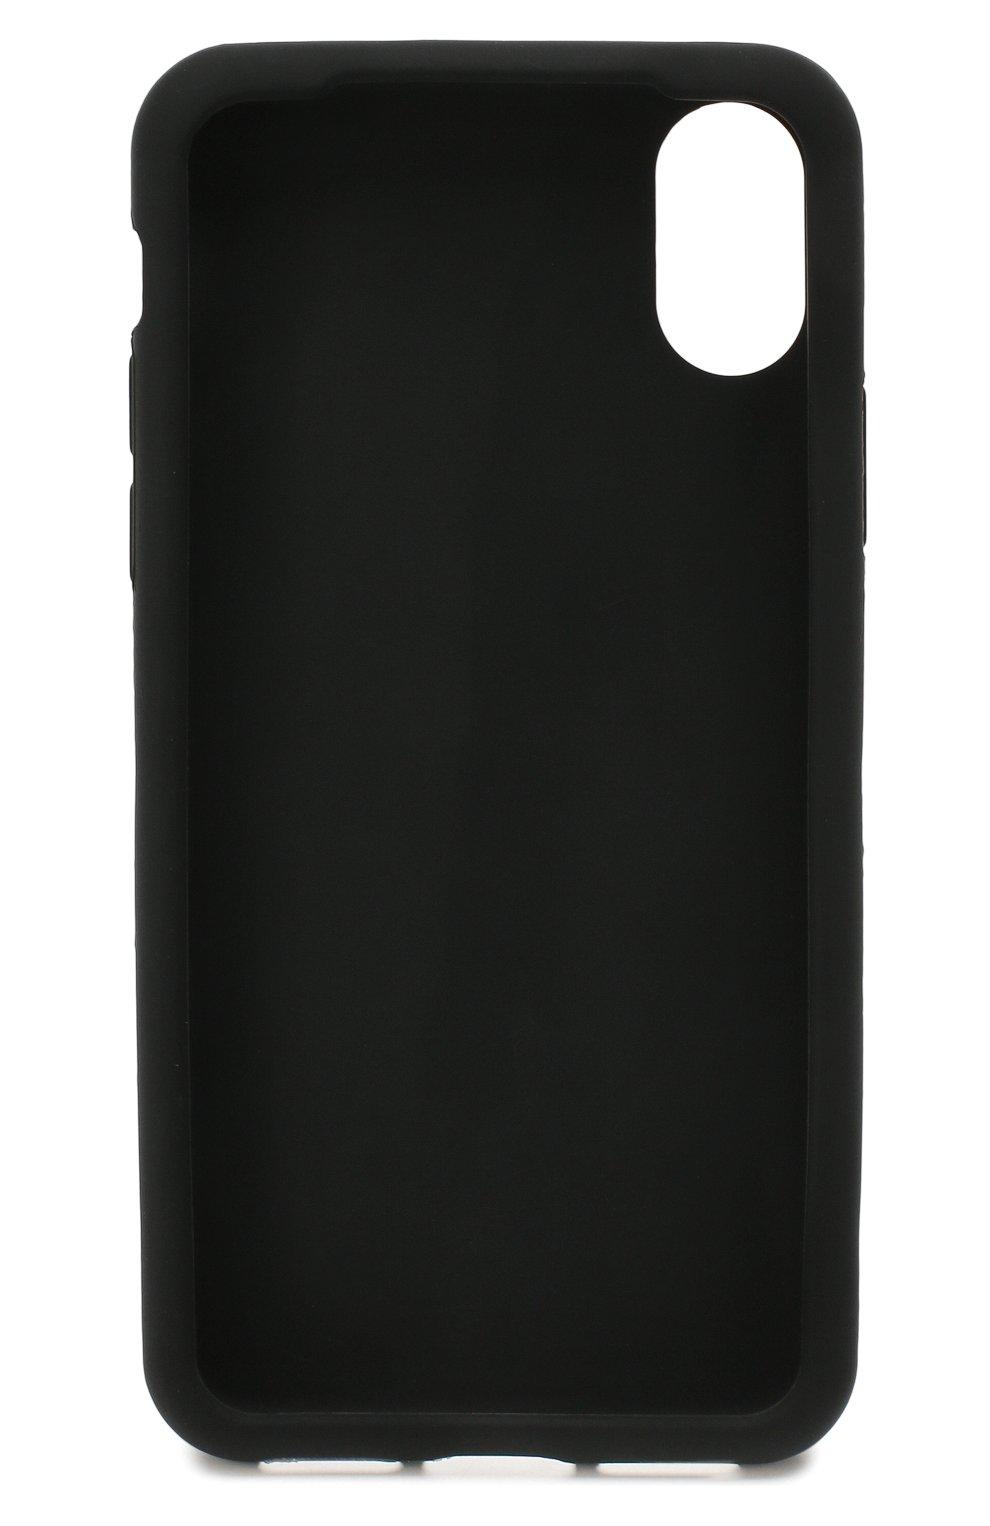 Мужской чехол для iphone xr DOLCE & GABBANA синего цвета, арт. BP2514/AJ980   Фото 2